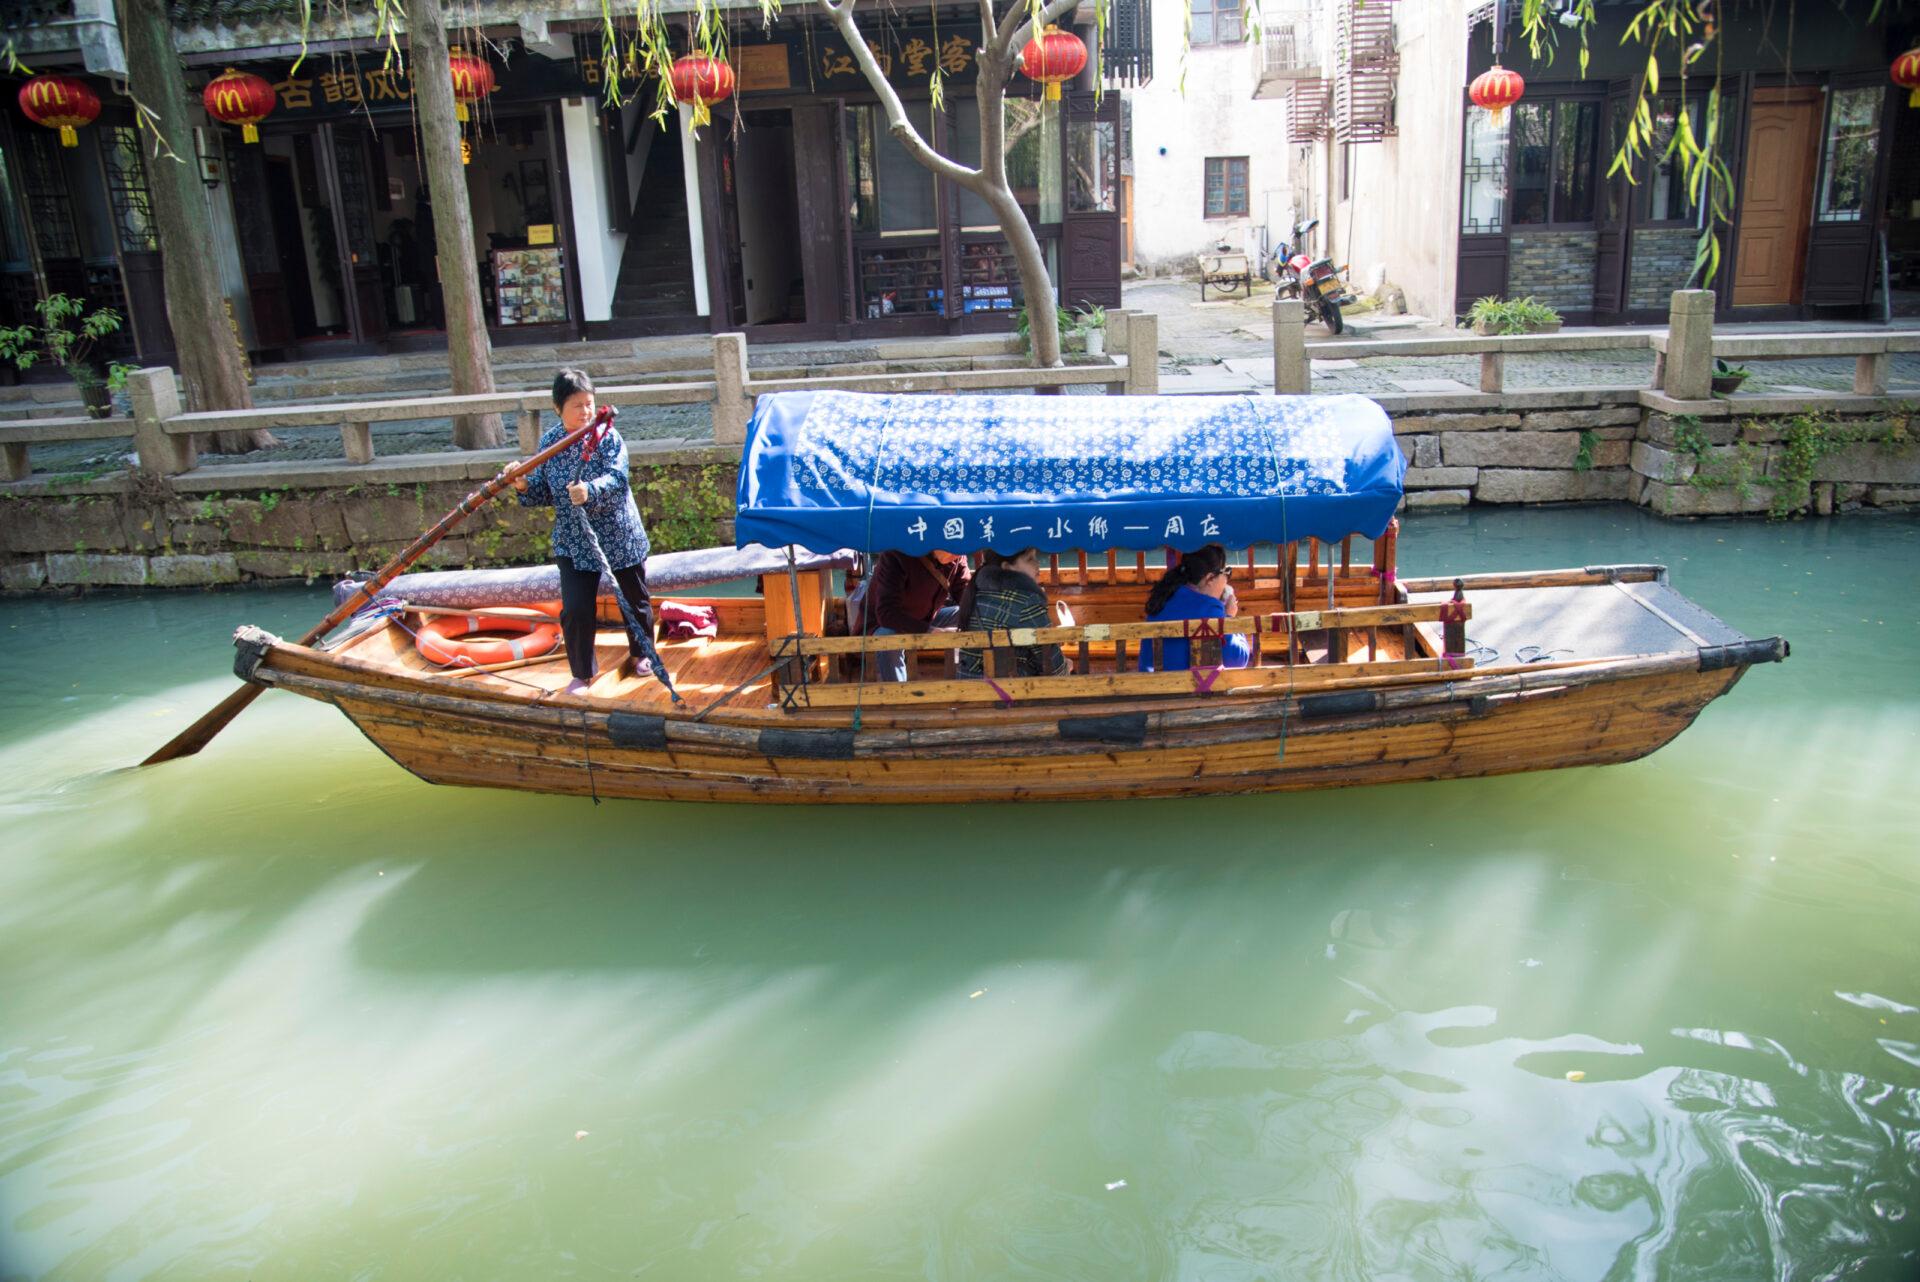 Чжоучжуан— Китайская Венеция.